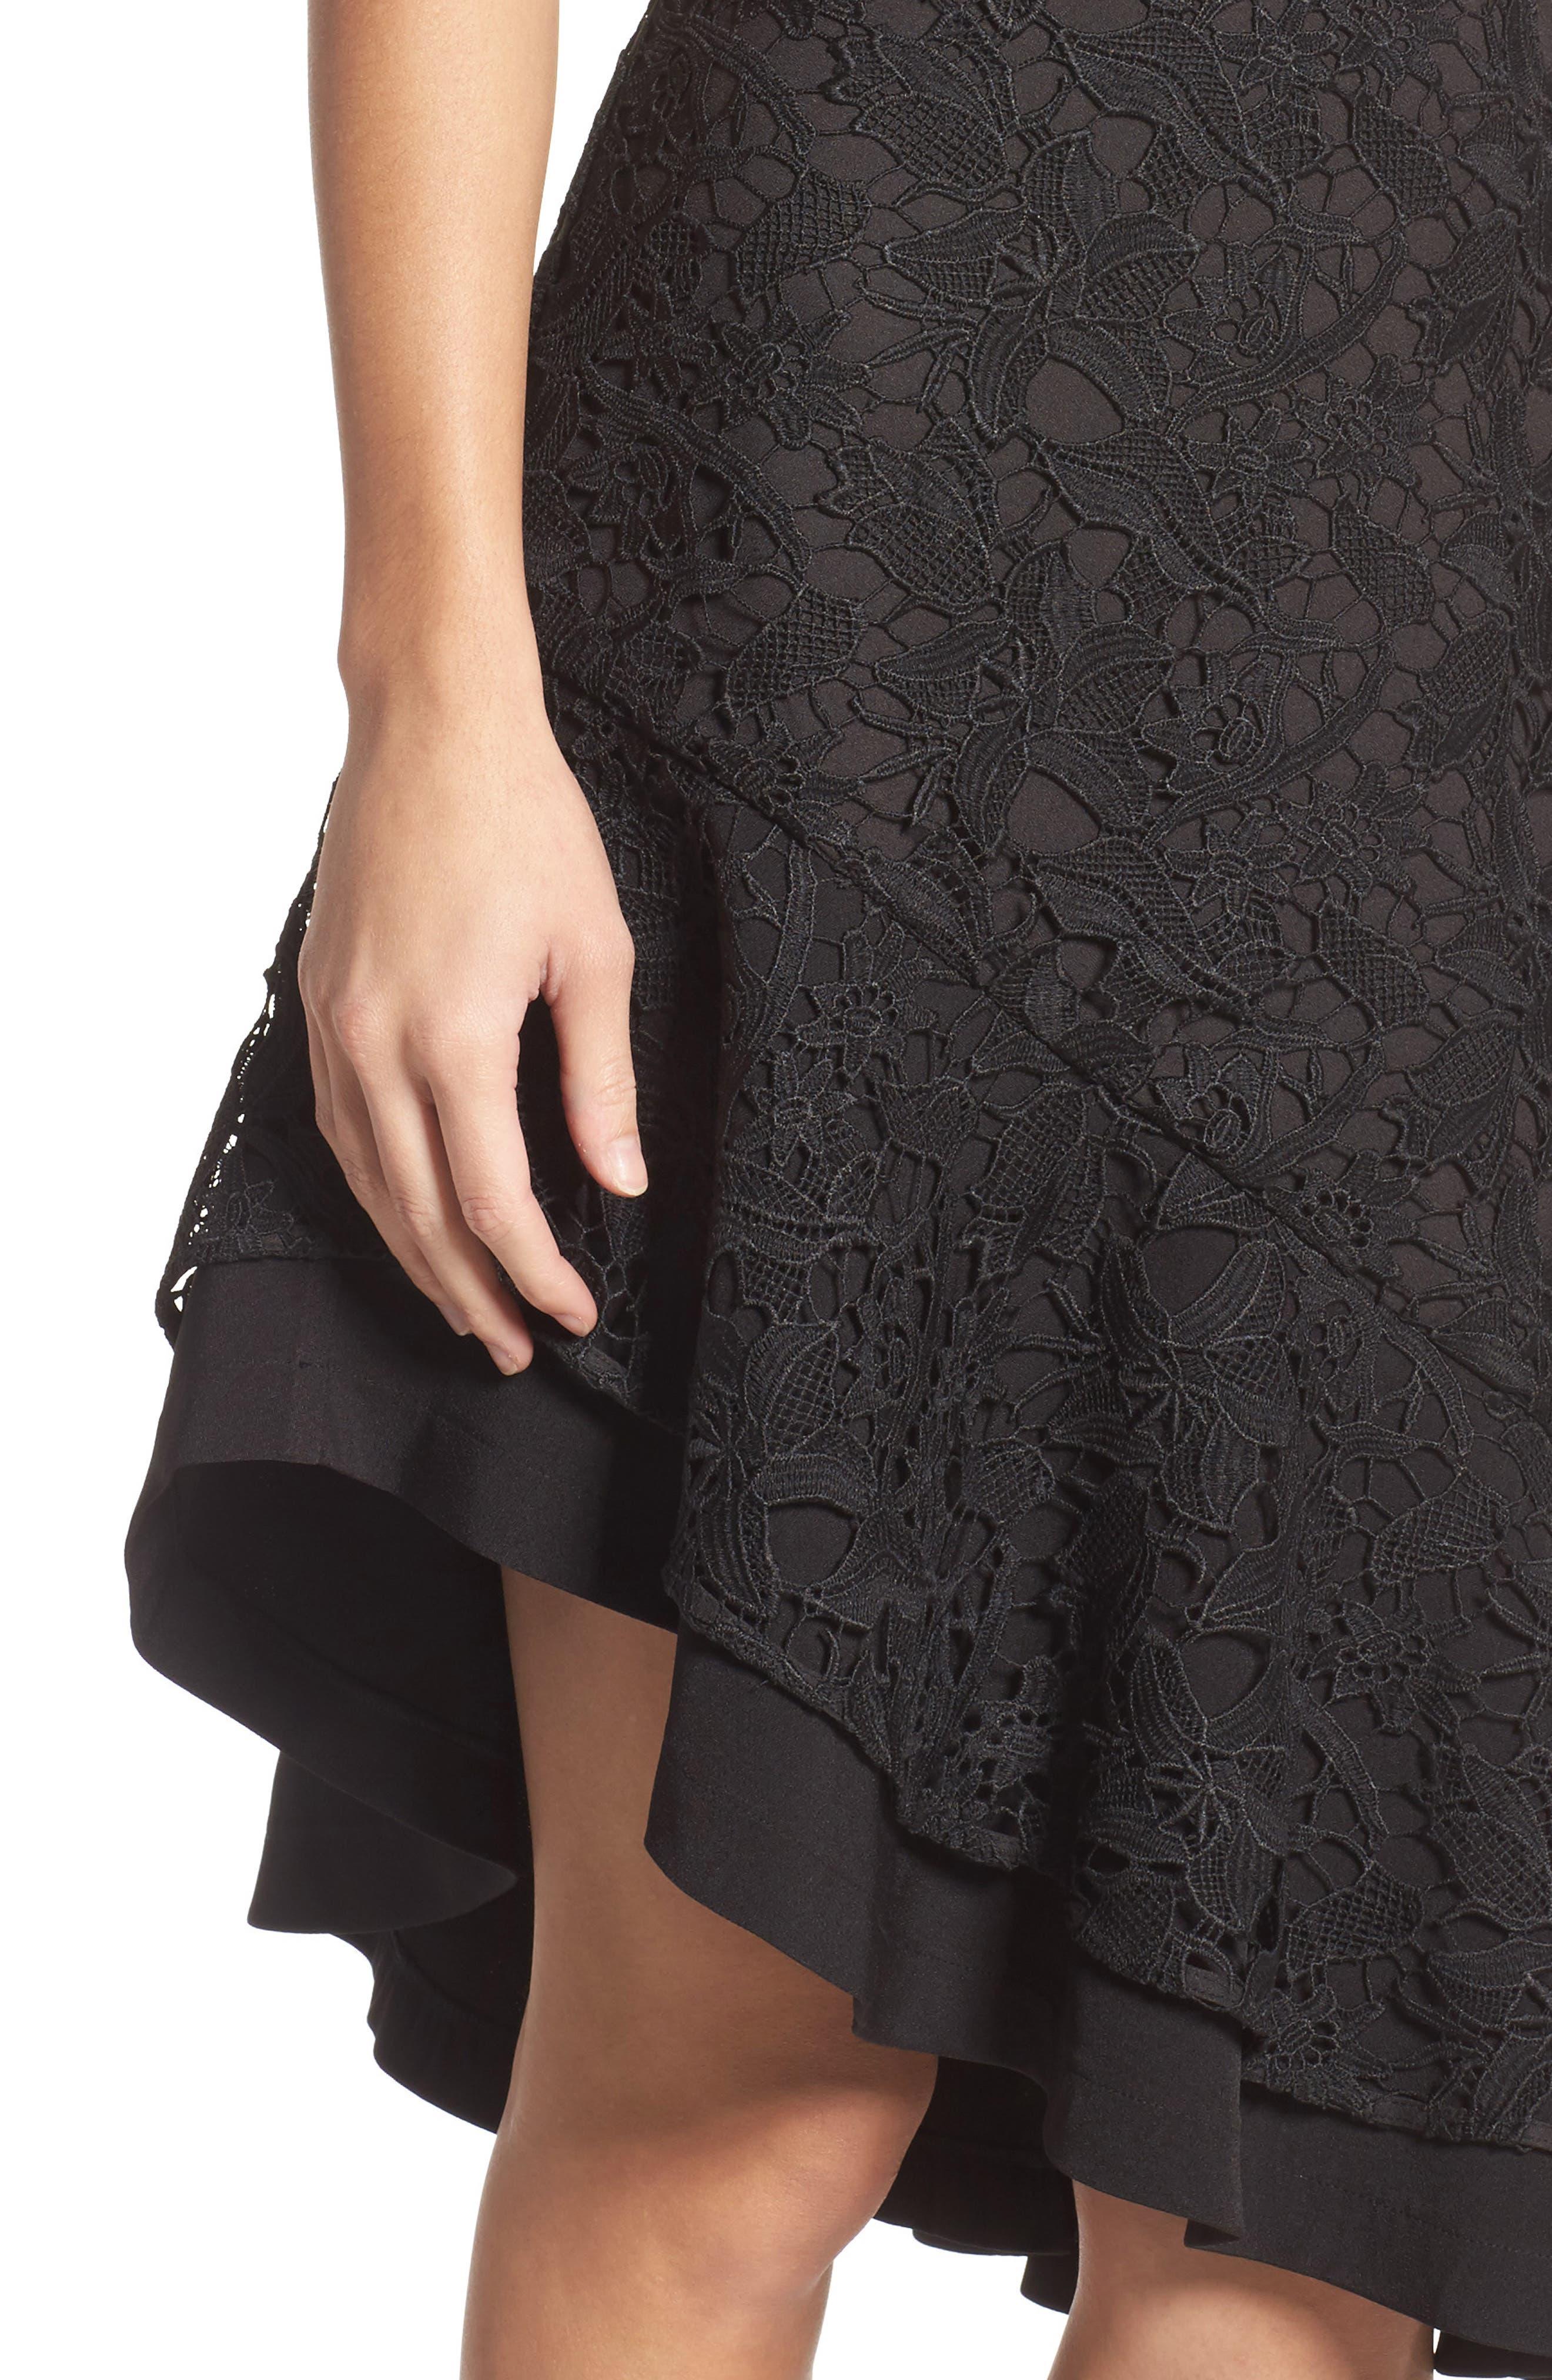 Lace Asymmetrical Dress,                             Alternate thumbnail 4, color,                             001